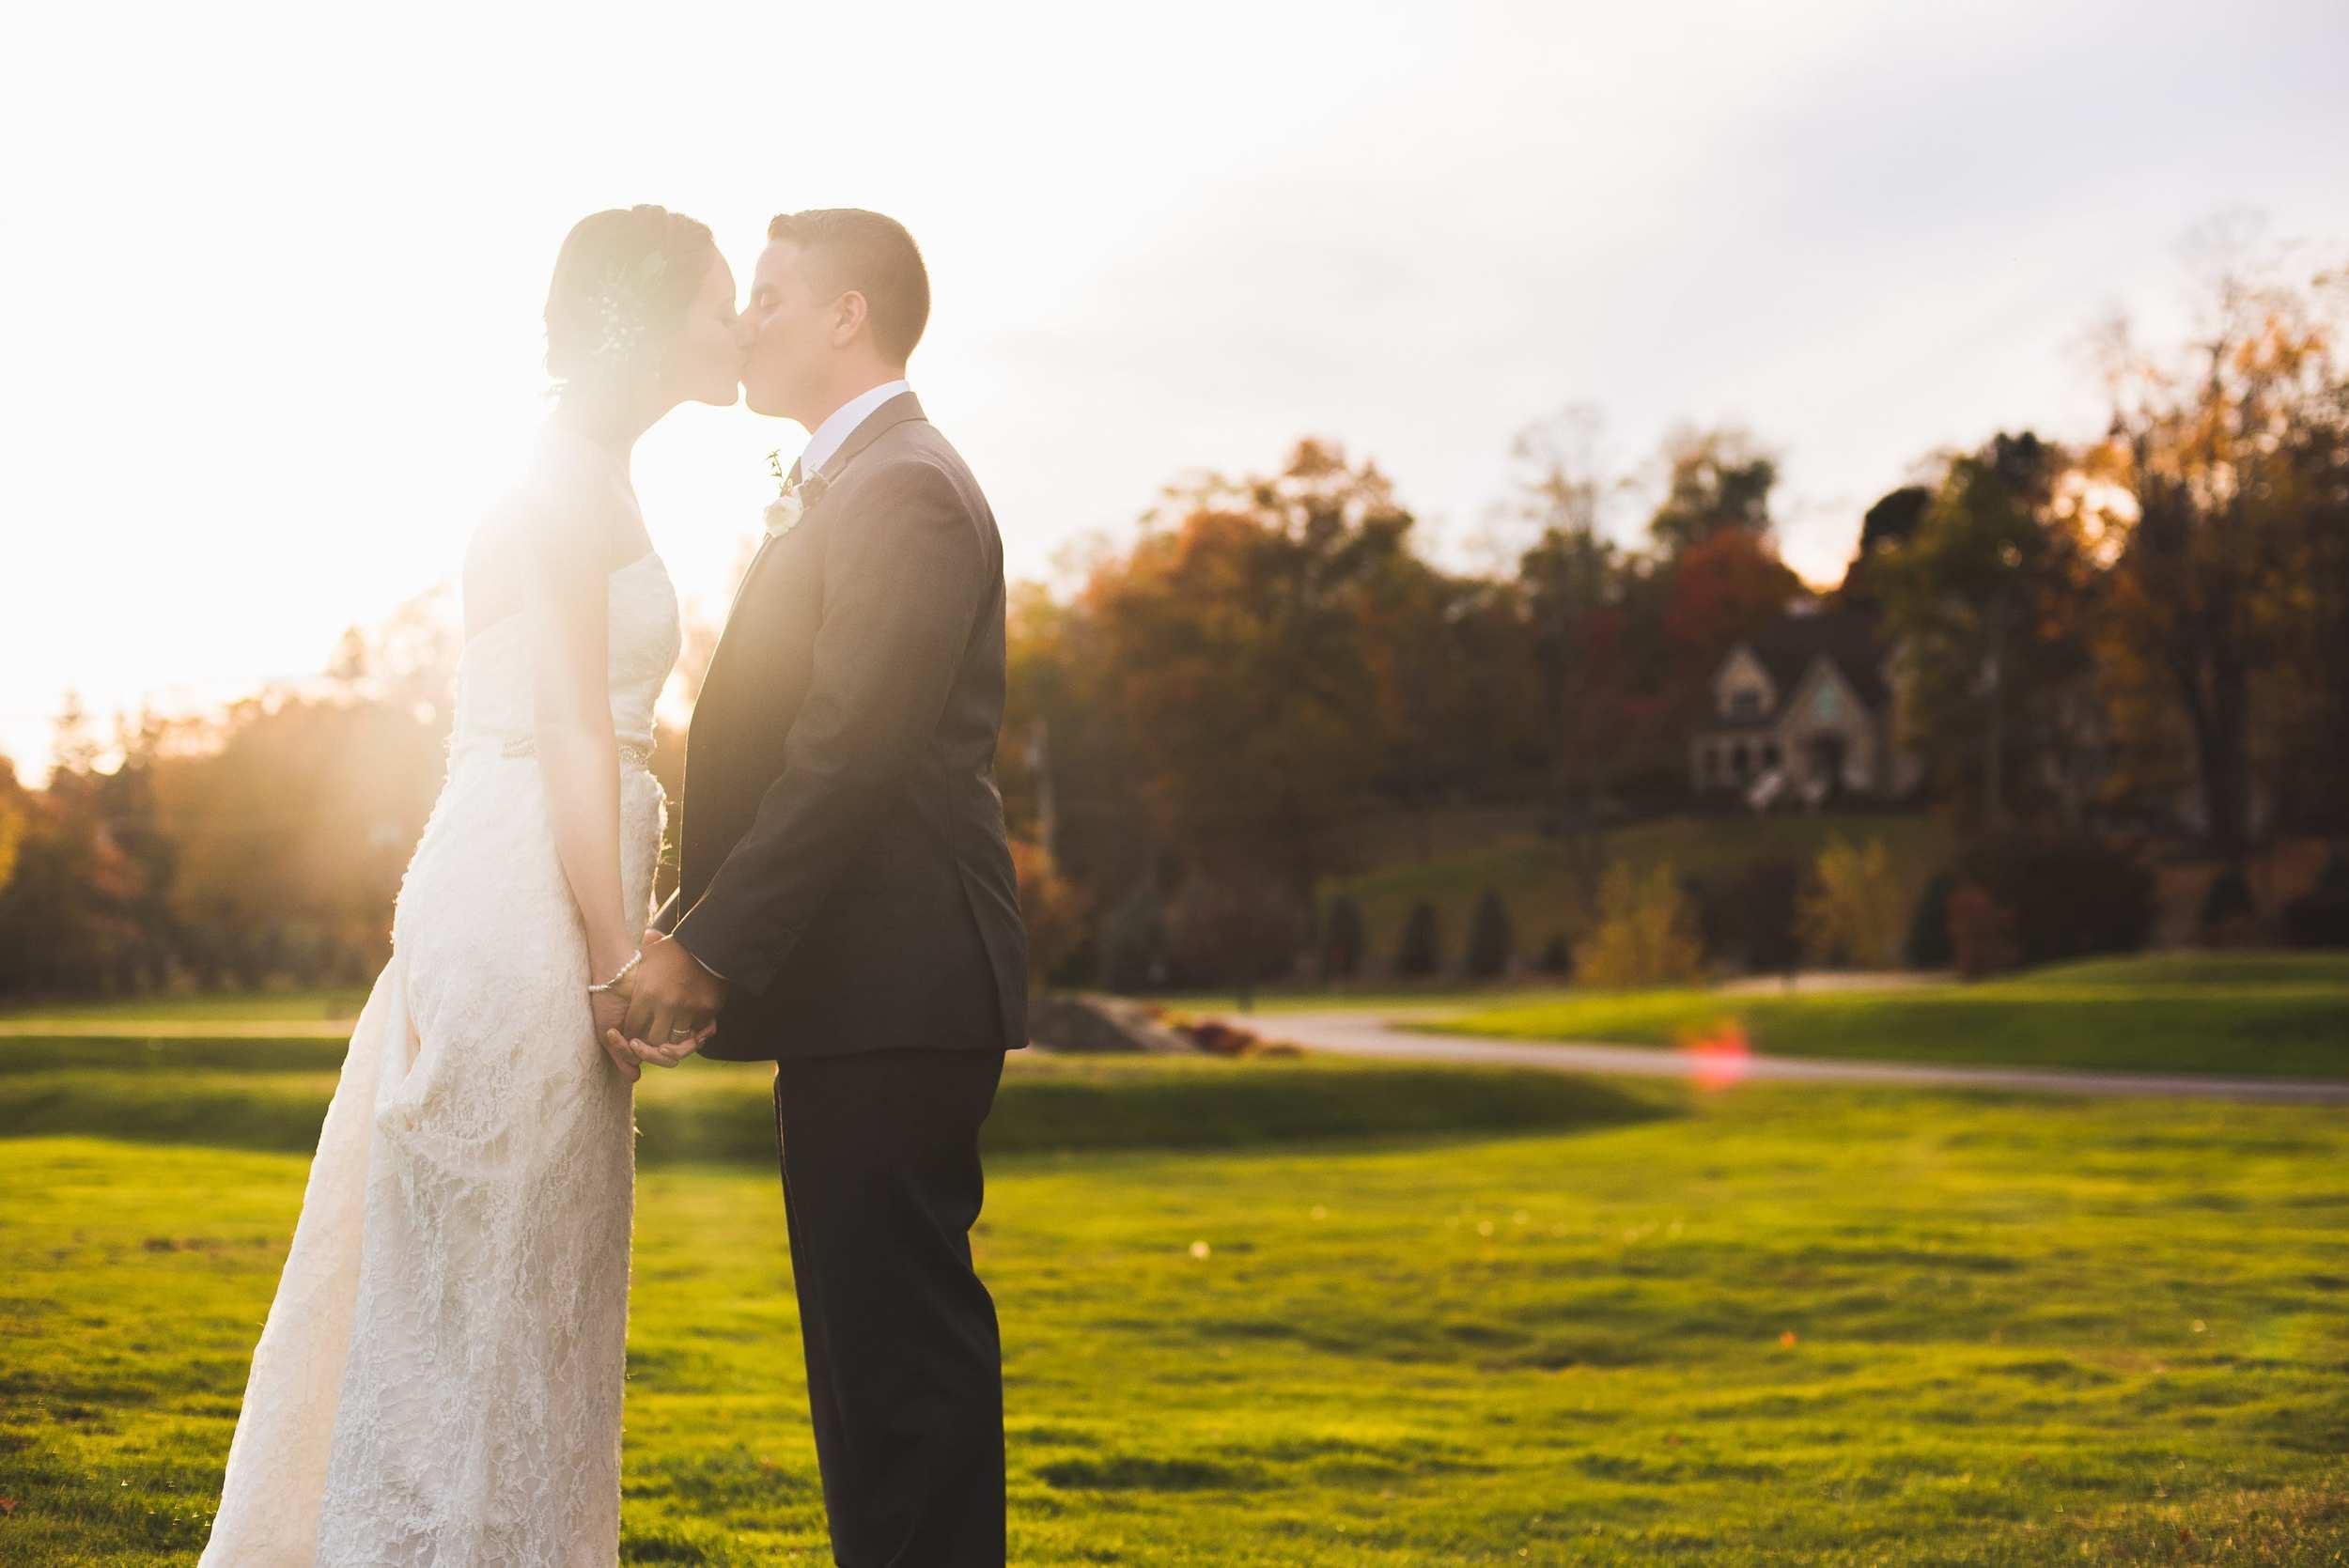 New-York-Wedding-Photographer-Falkirk-Wedding(146of163)-min.jpg